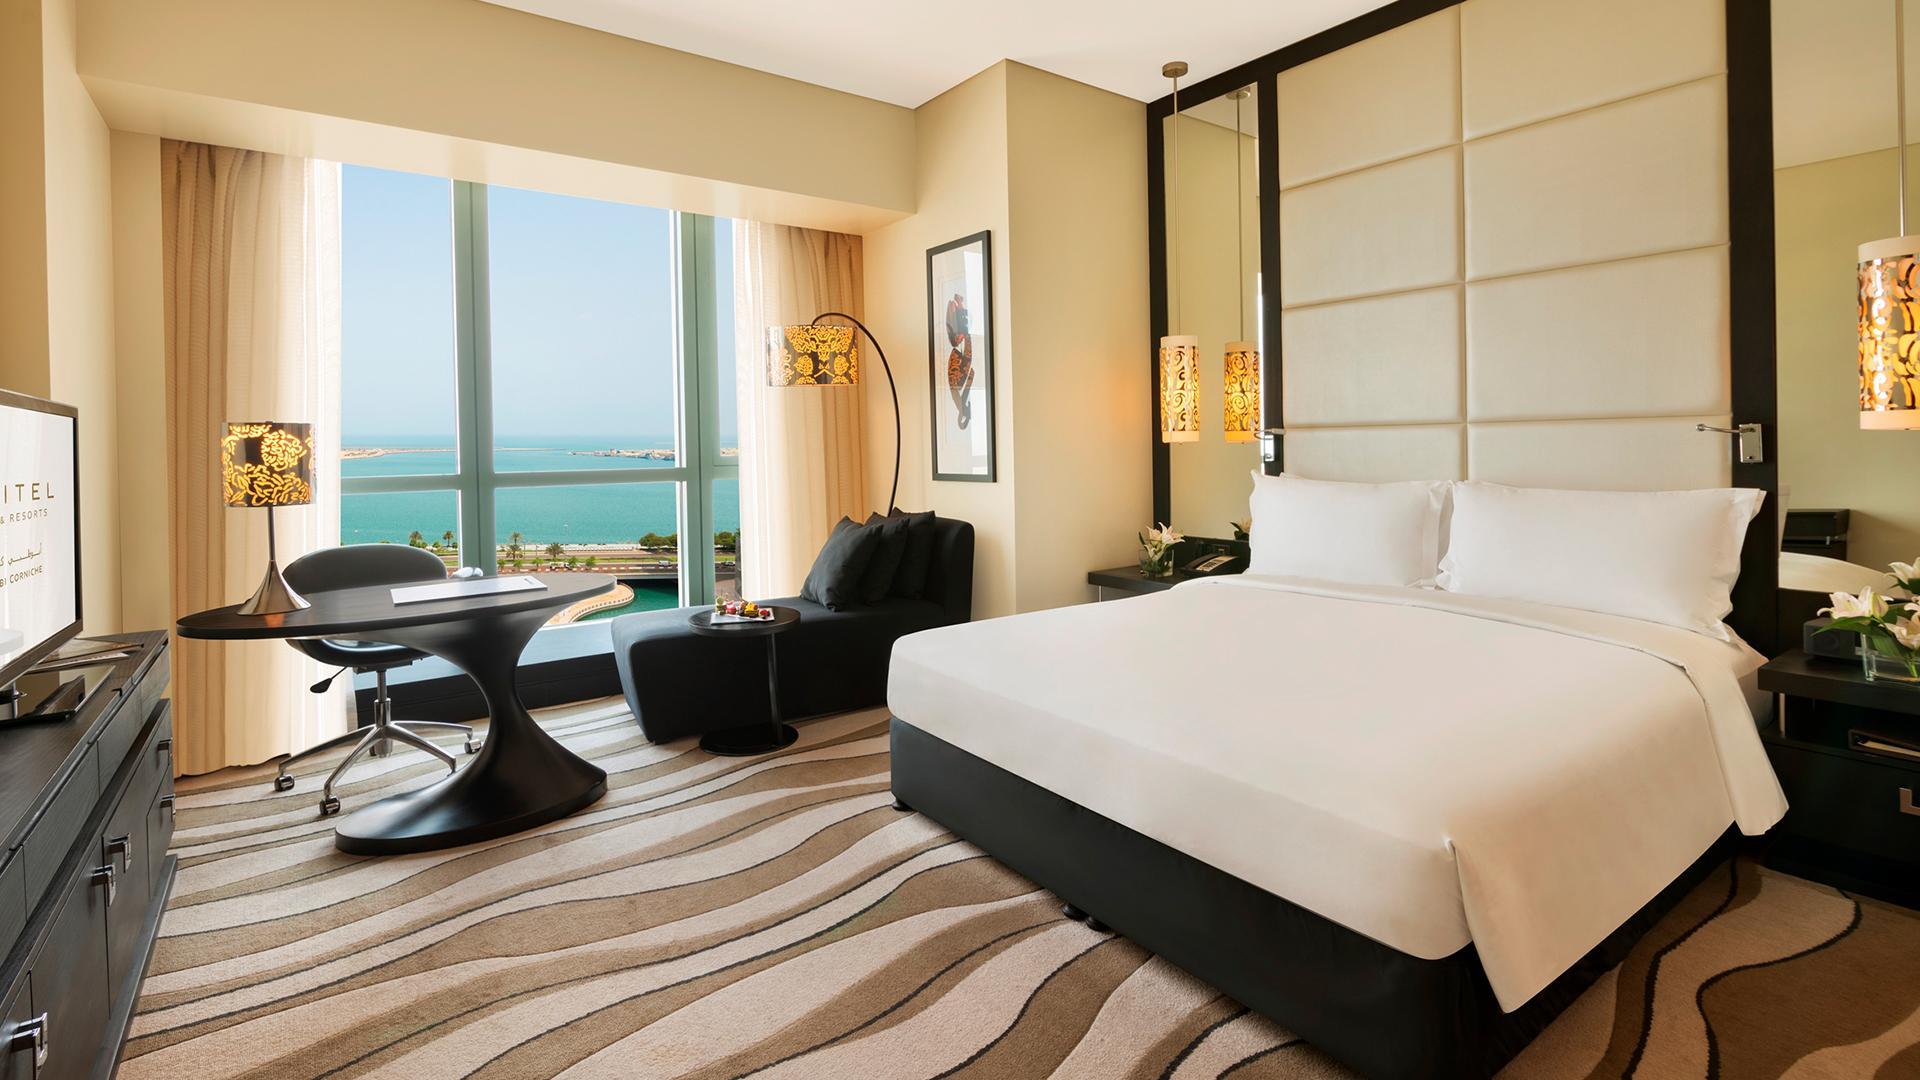 Luxury Room image 1 at Sofitel Abu Dhabi Corniche by null, Abu Dhabi, United Arab Emirates